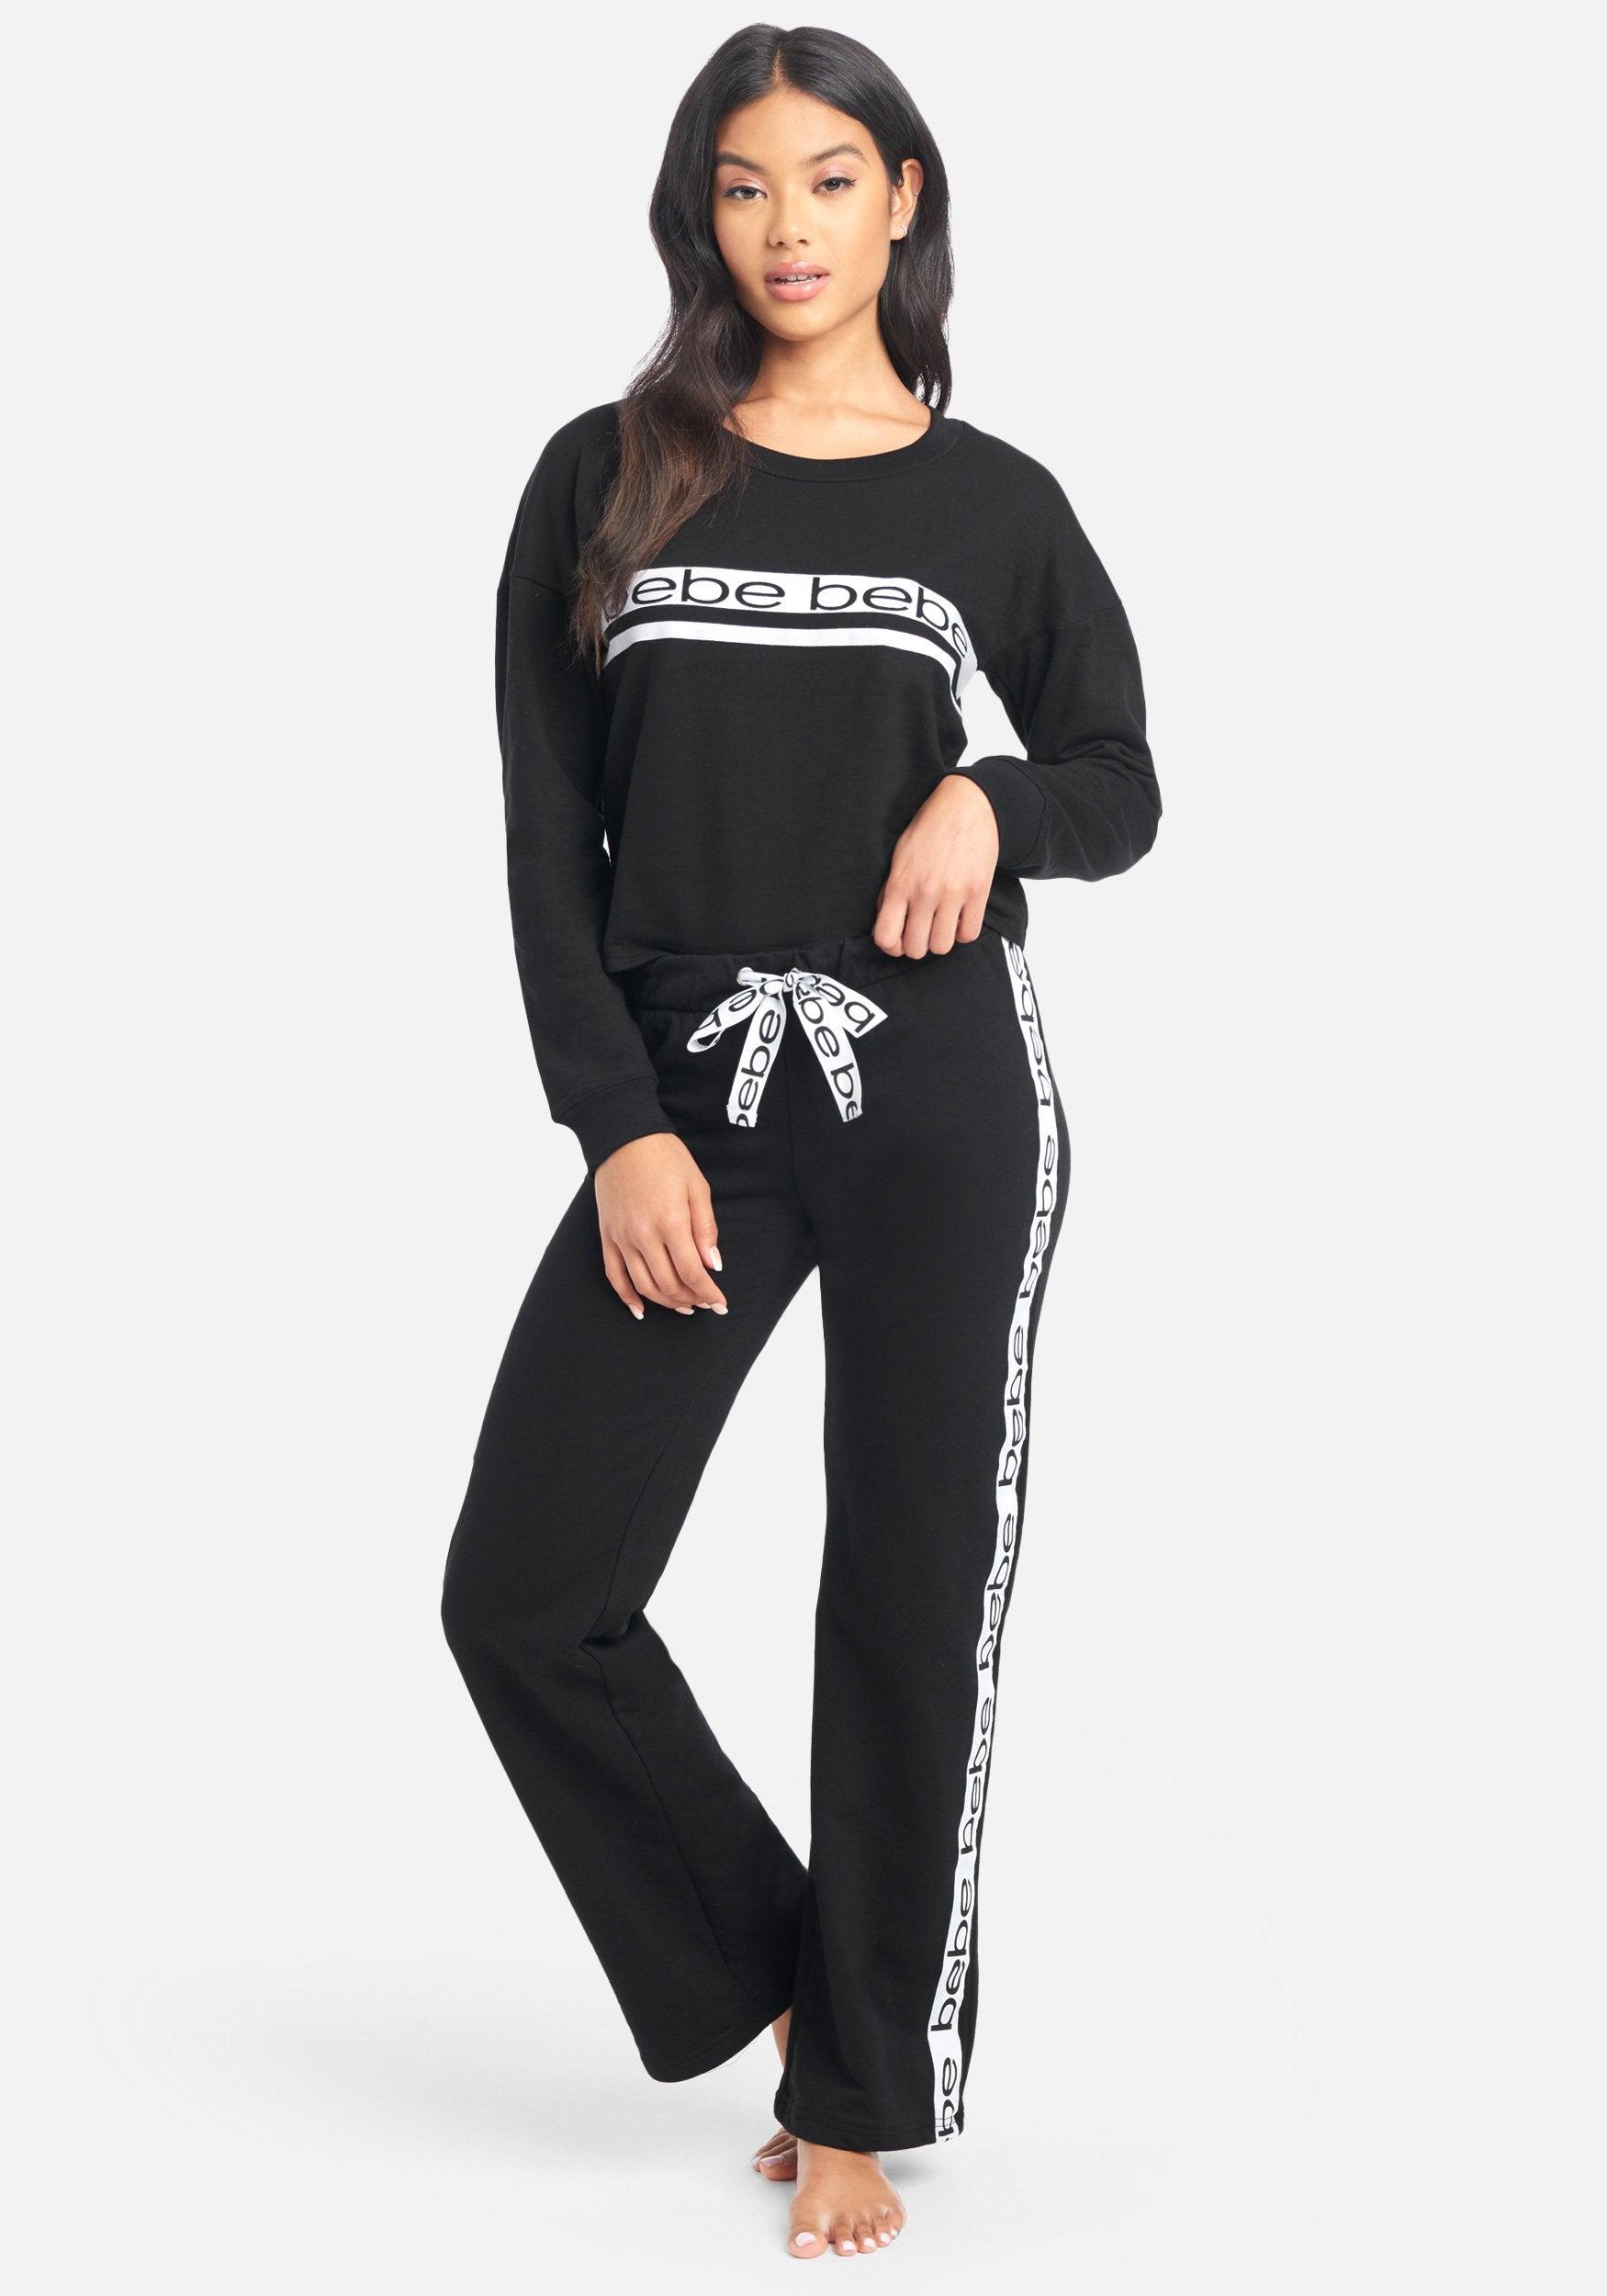 Bebe Women's Sport Stripe Pant Set, Size Medium in Black Cotton